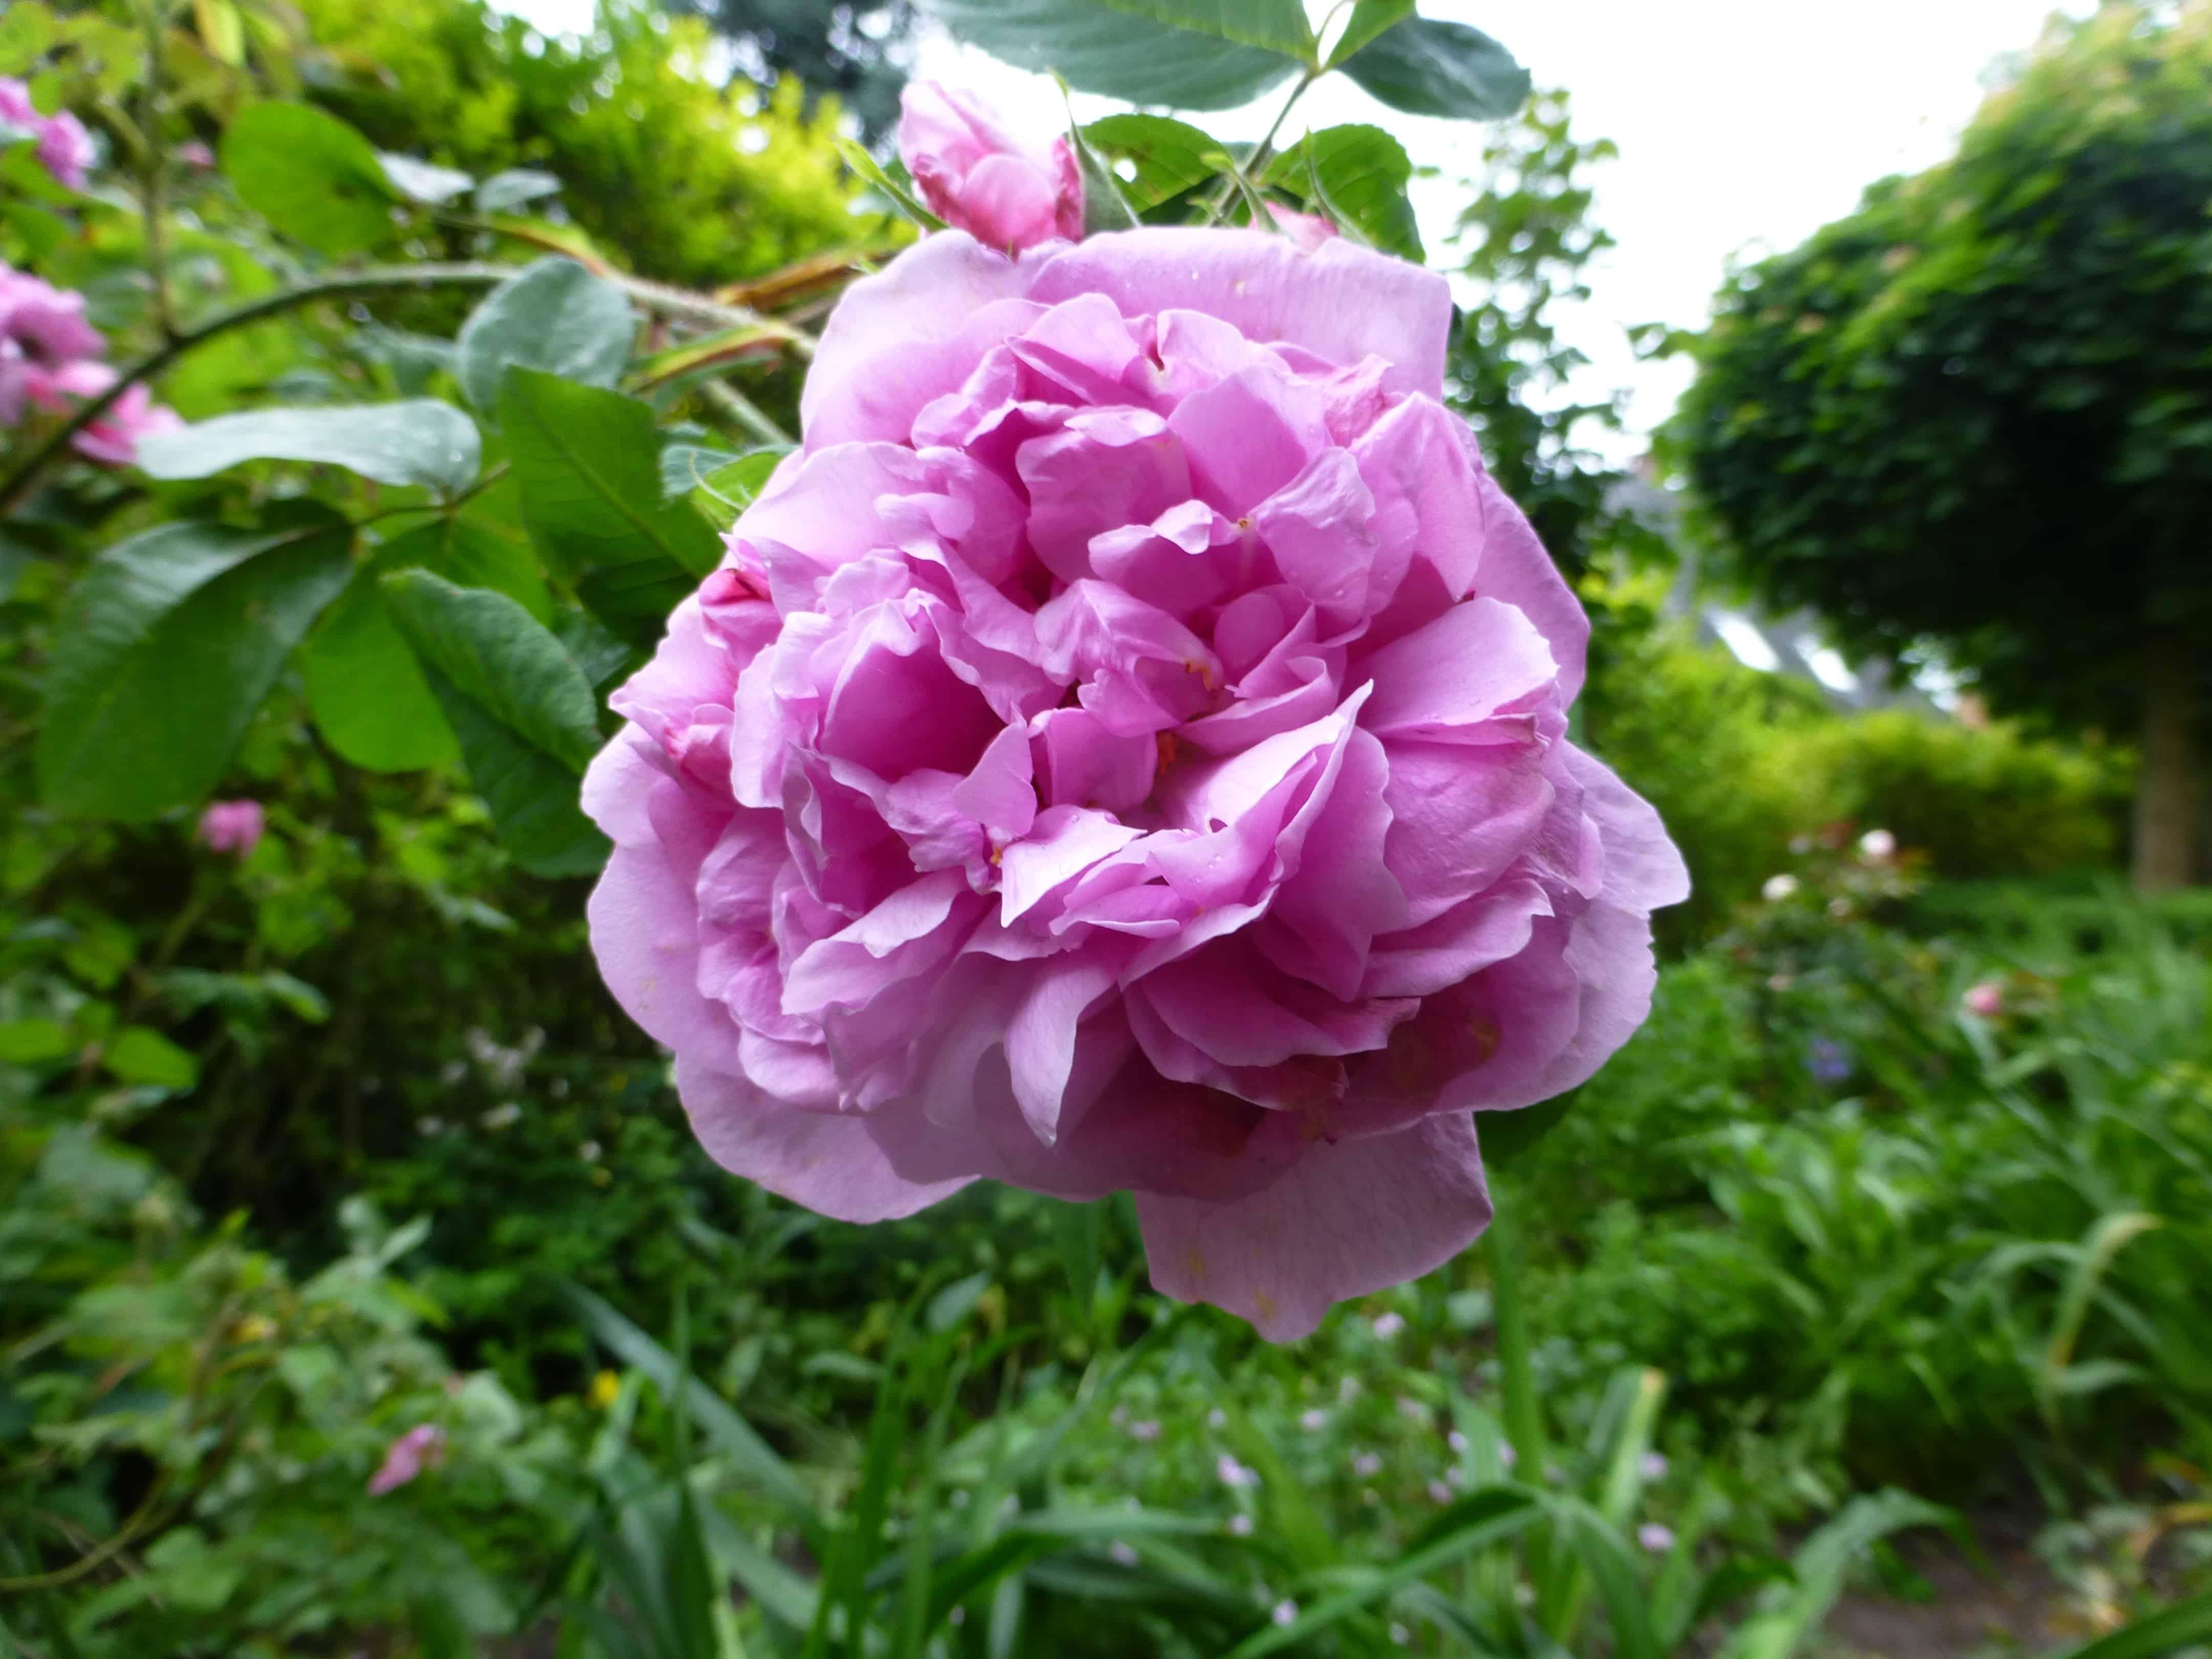 Die Blüte der Rose Portlandrose 'Comte de Chambord'